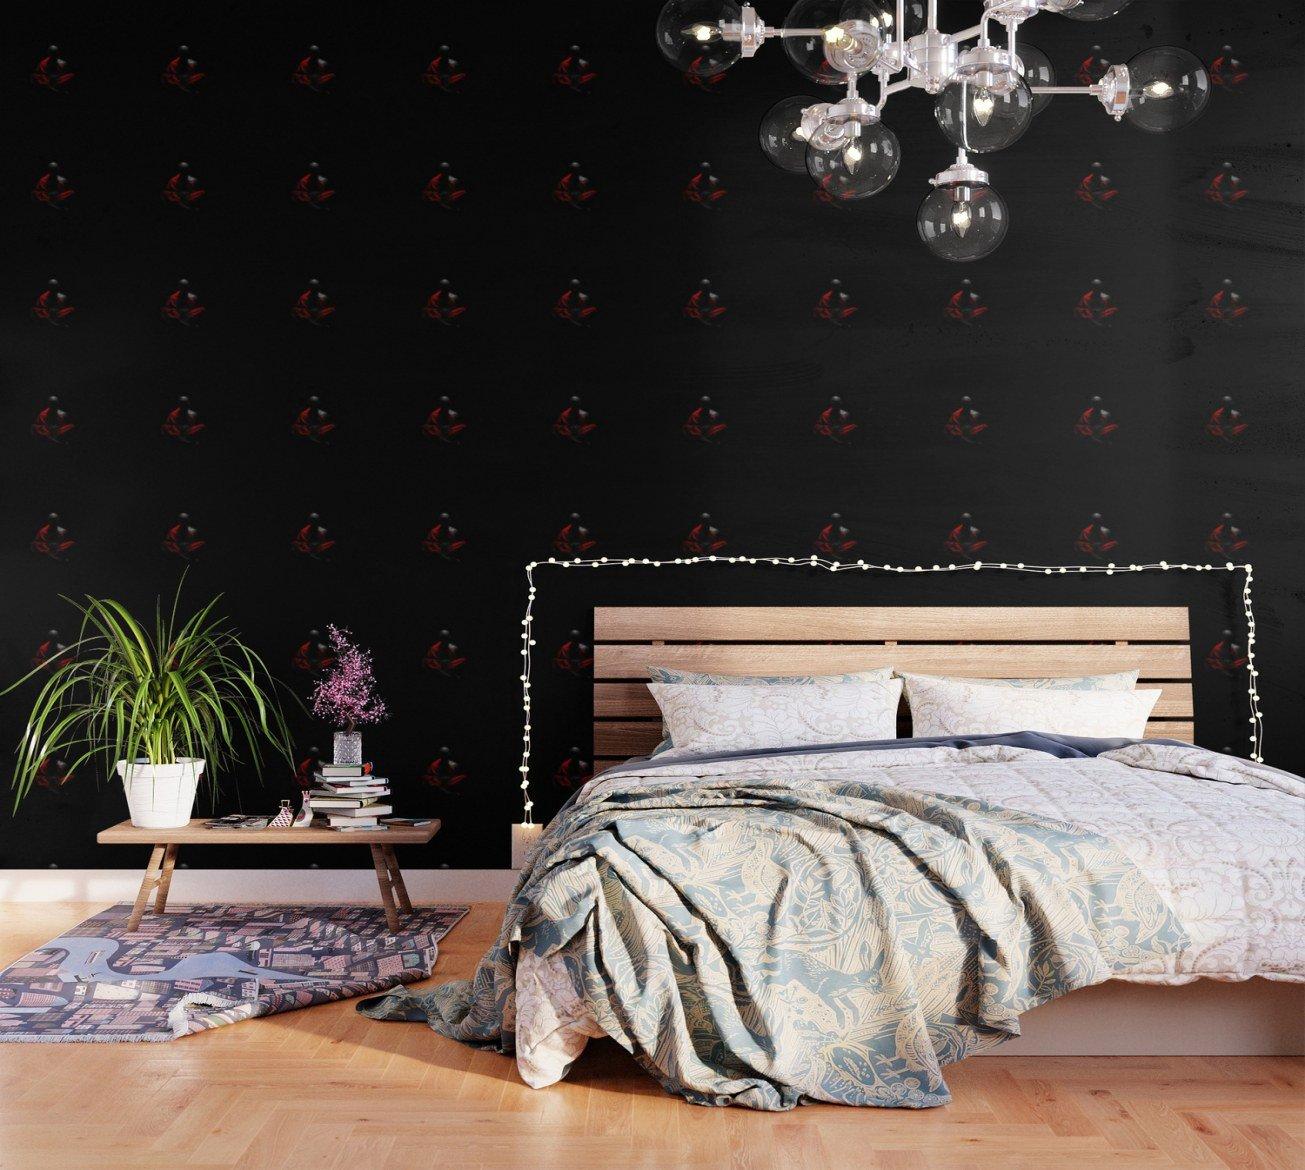 Wallpaper Accent Wall Bedroom Fresh Wallpaper Accent Wall Buddhist Monk 207 Wallpaper Home